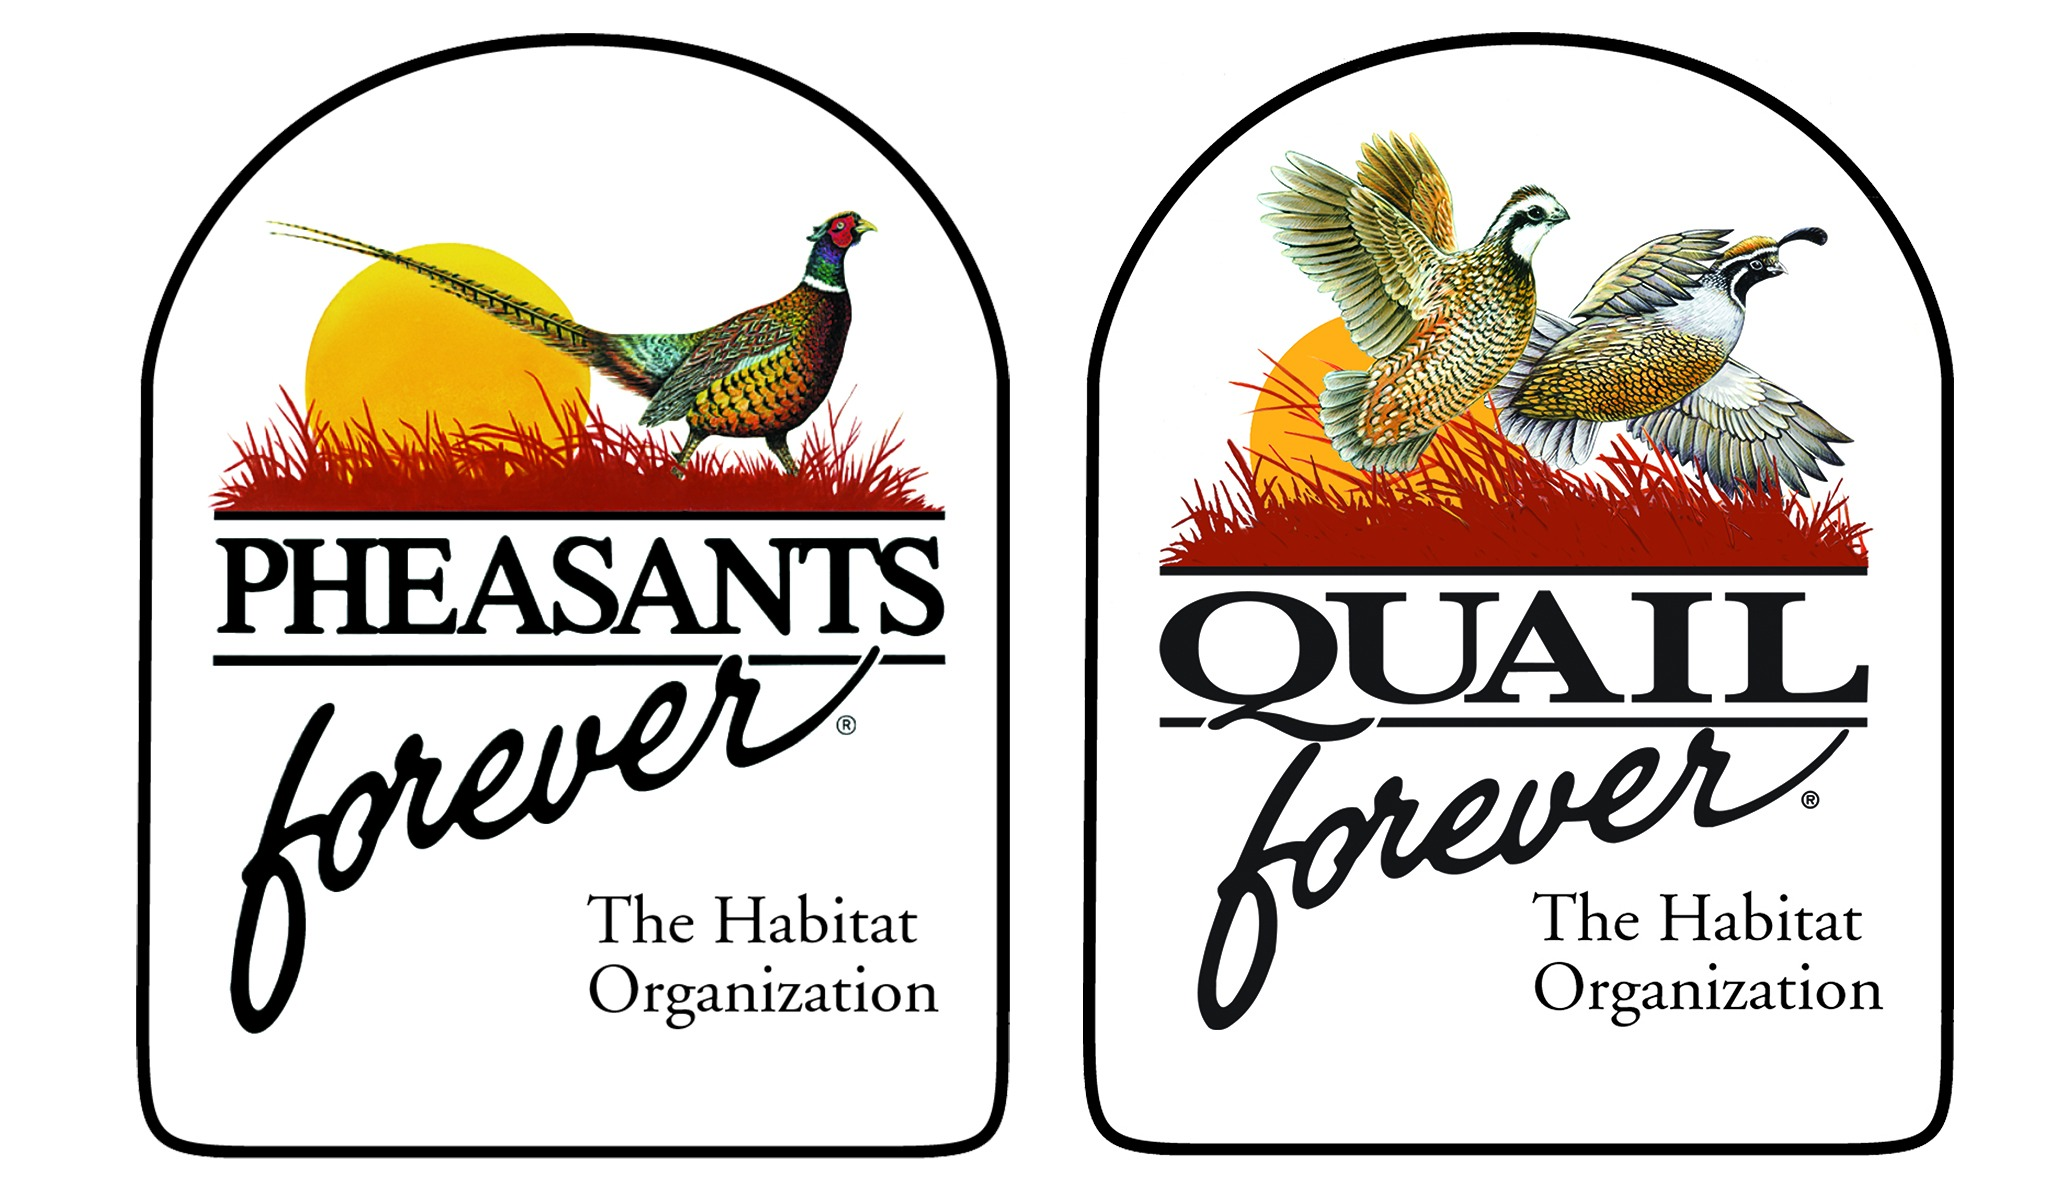 pheasants and quail forever logo